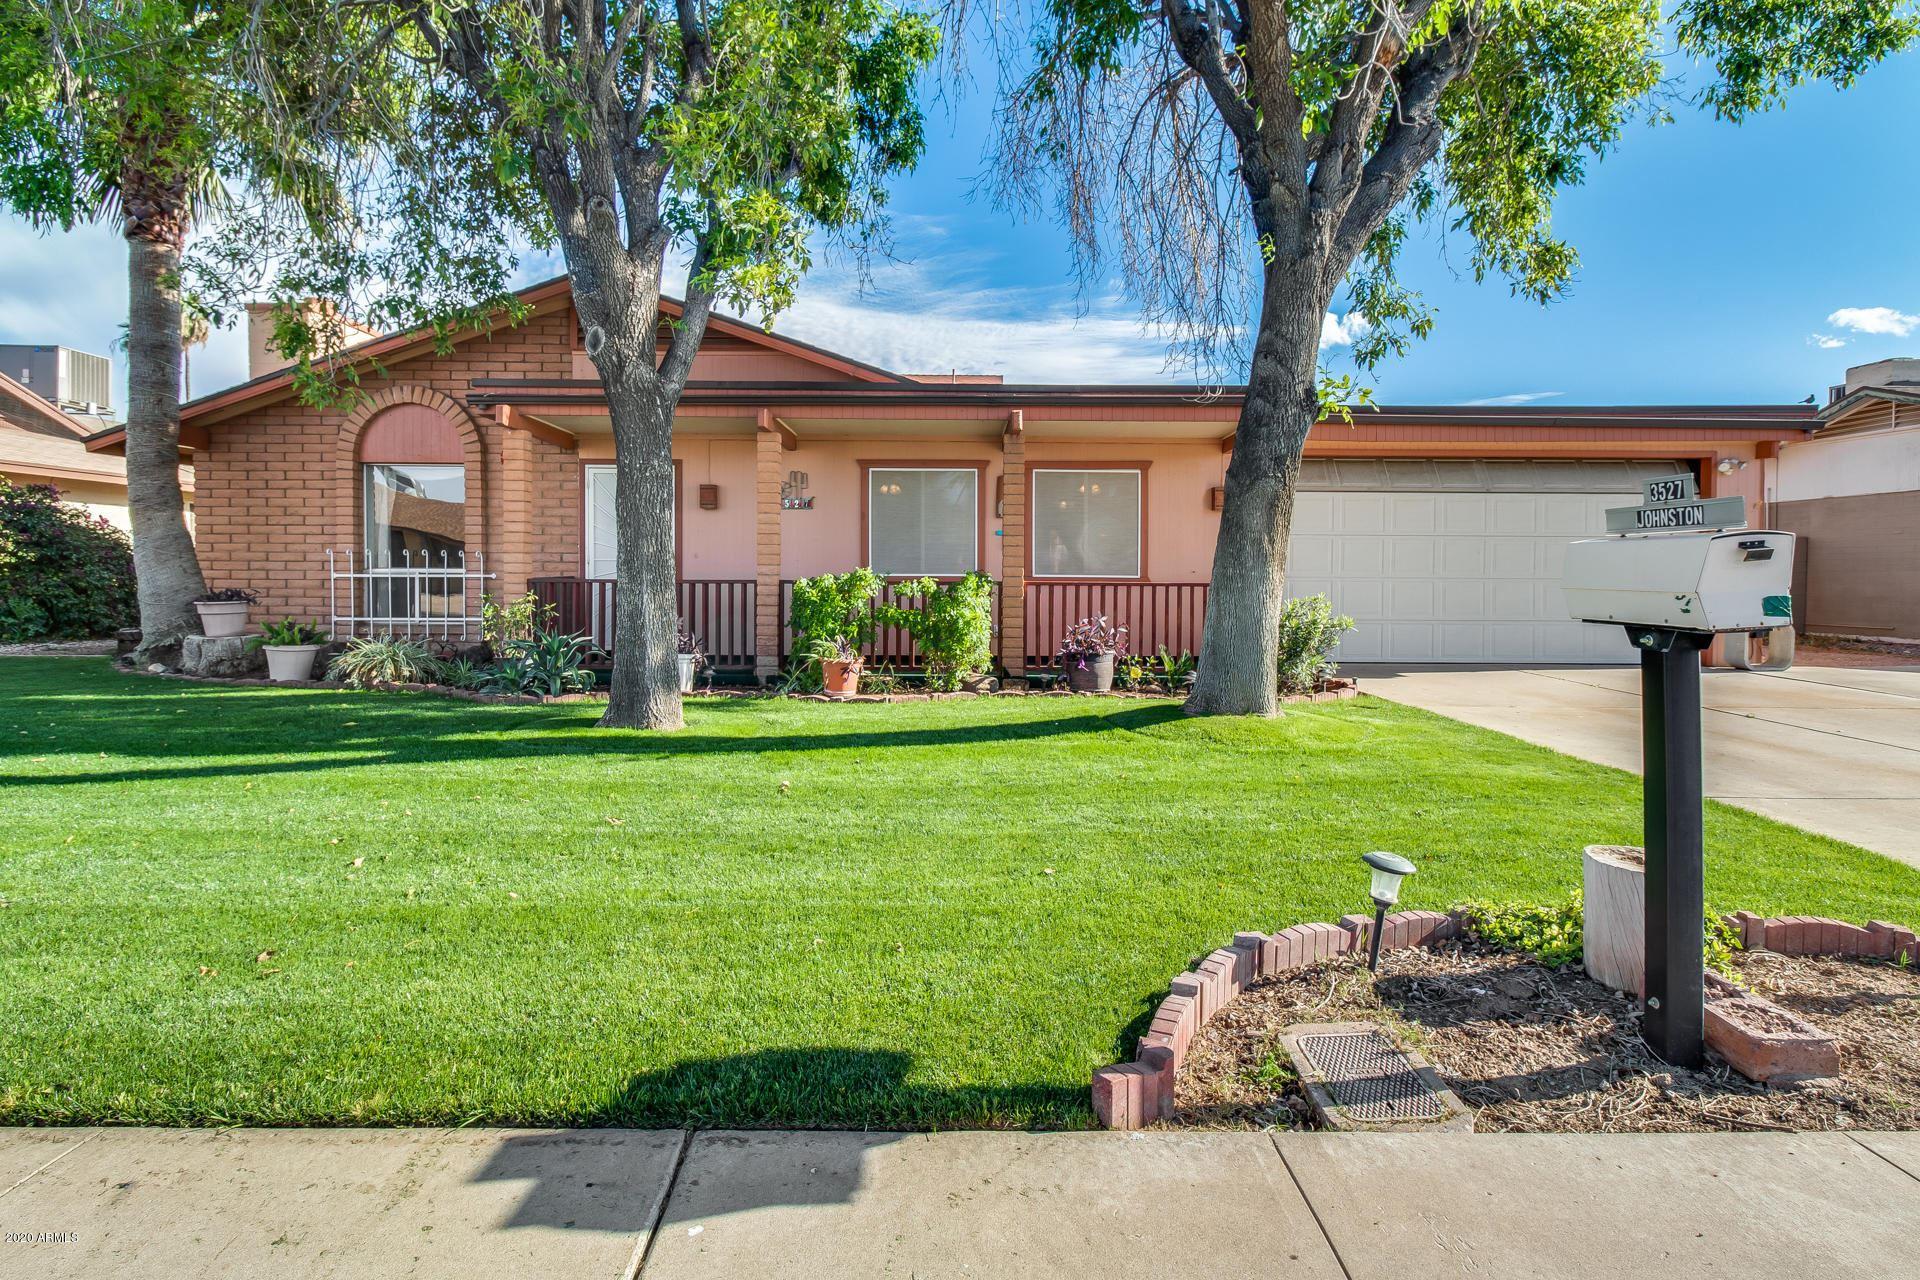 3527 W YUCCA Street, Phoenix, AZ 85029 - MLS#: 6057764